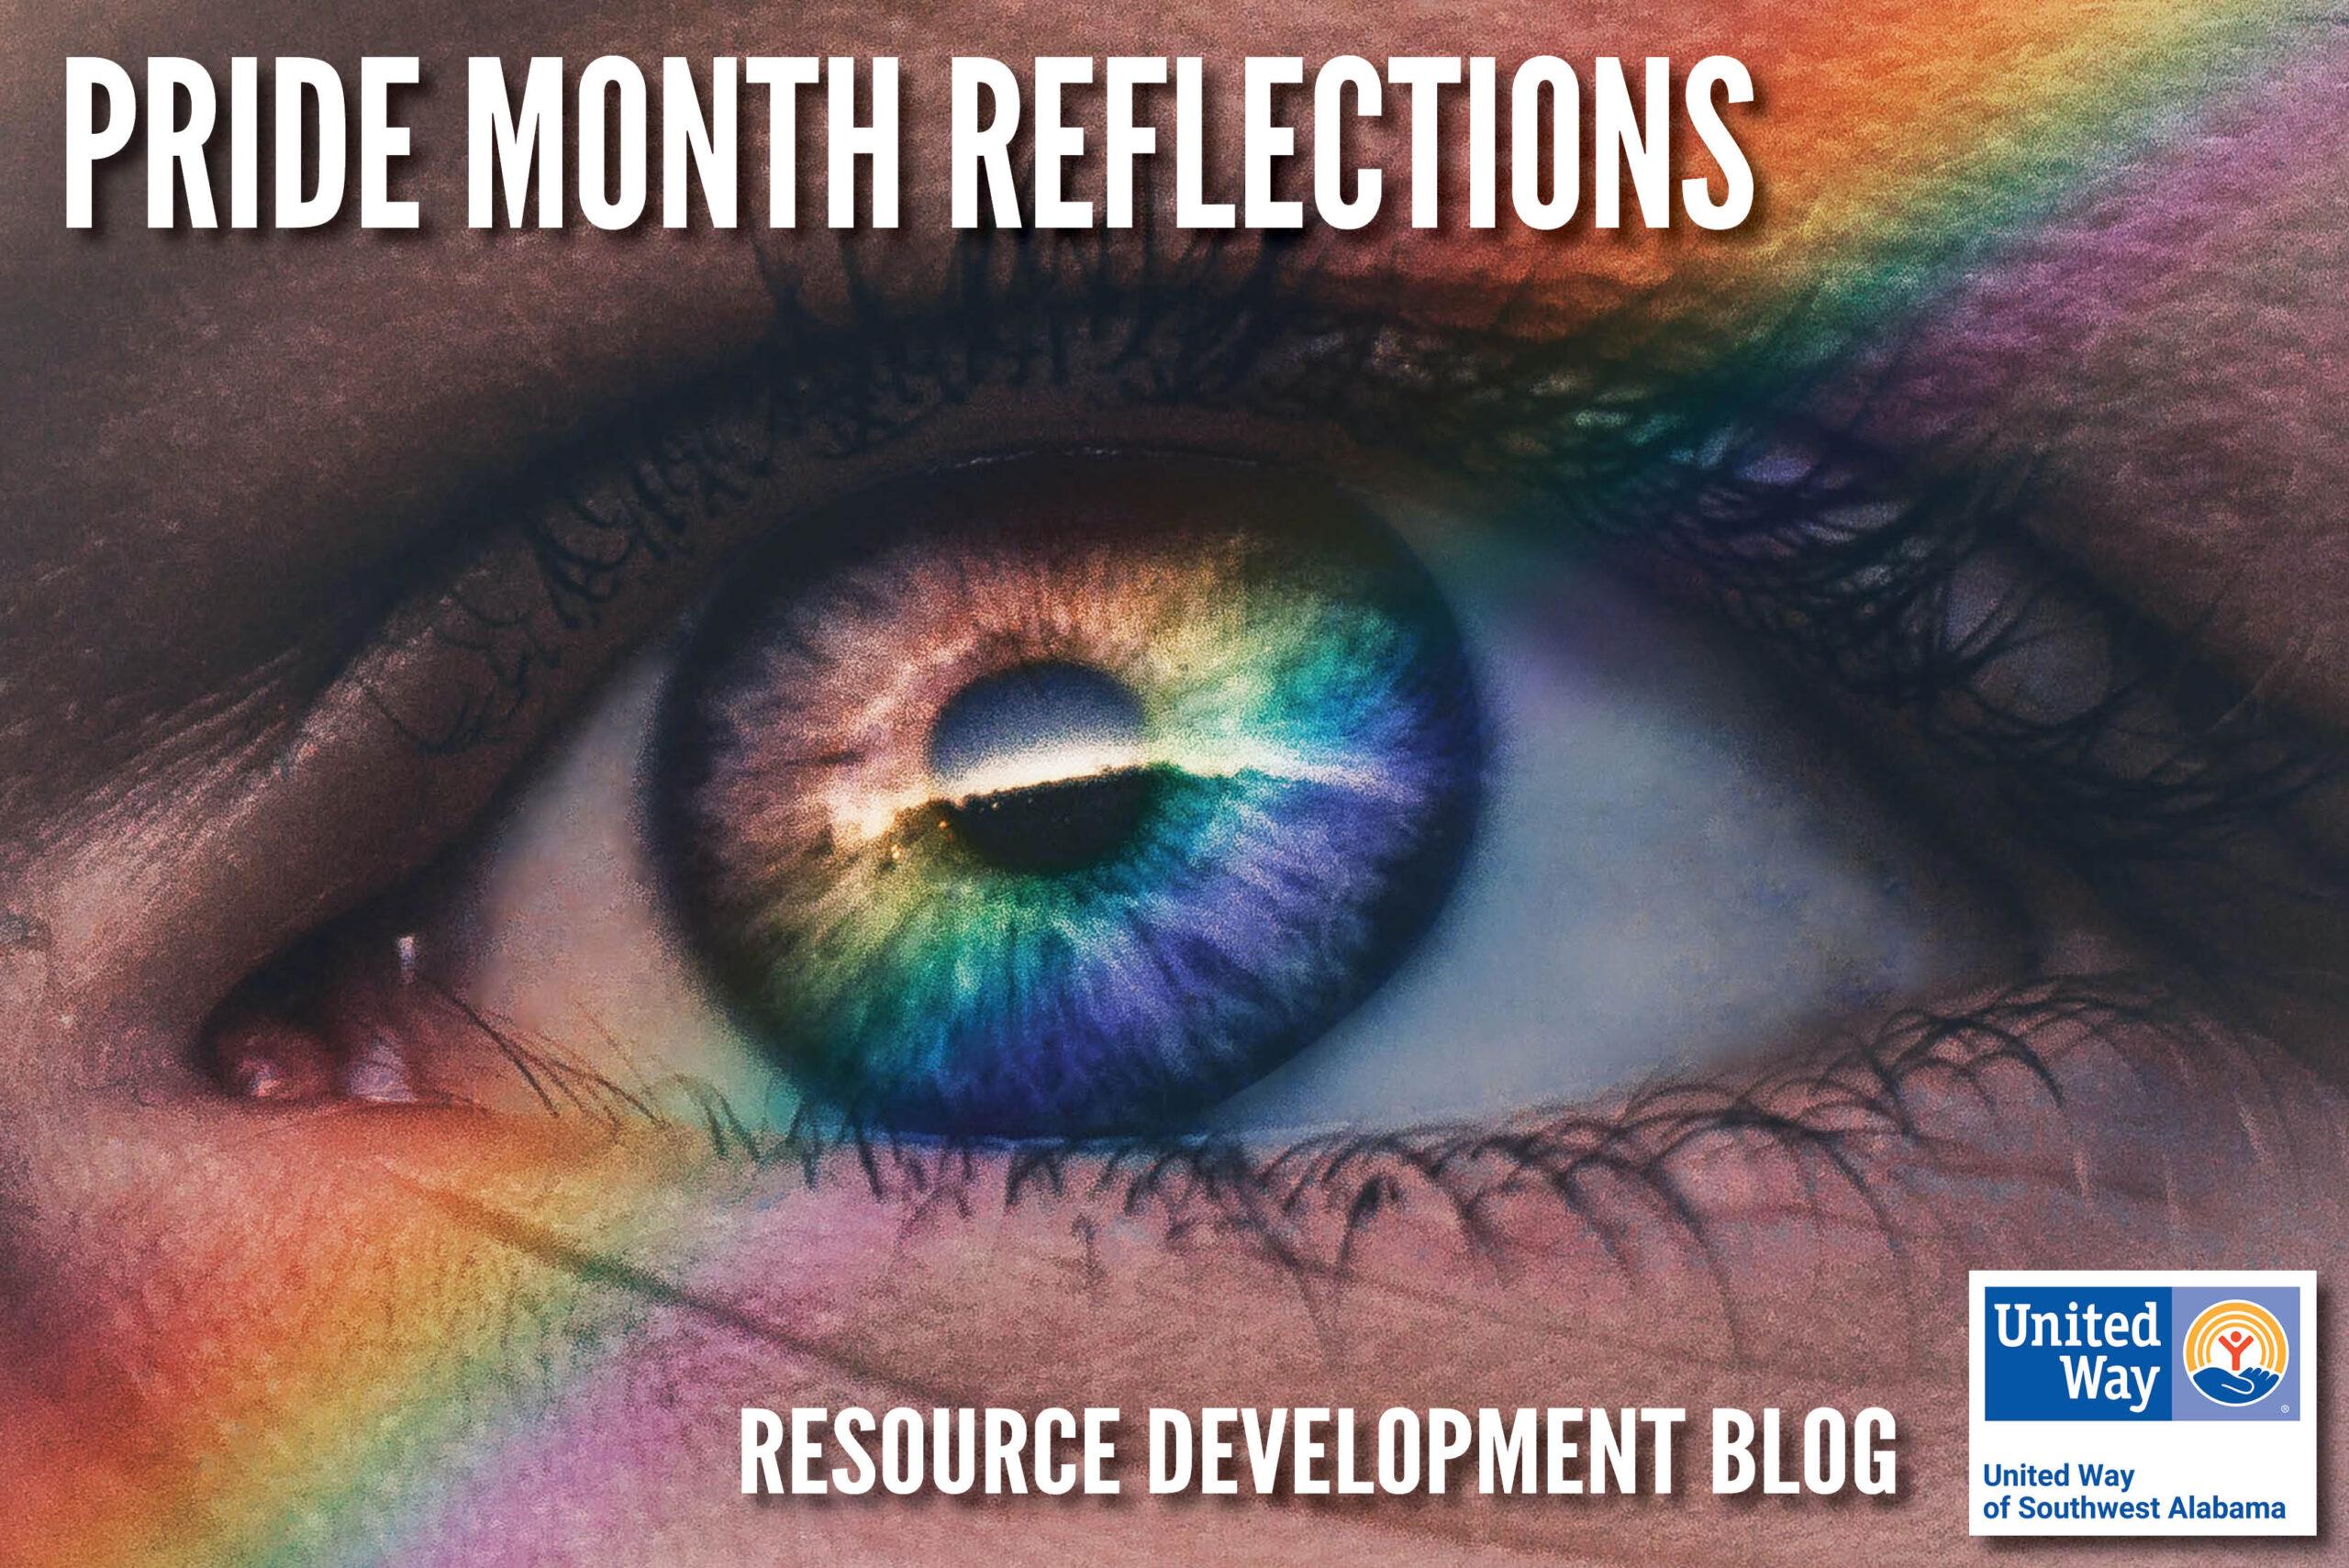 June Resource Development Blog